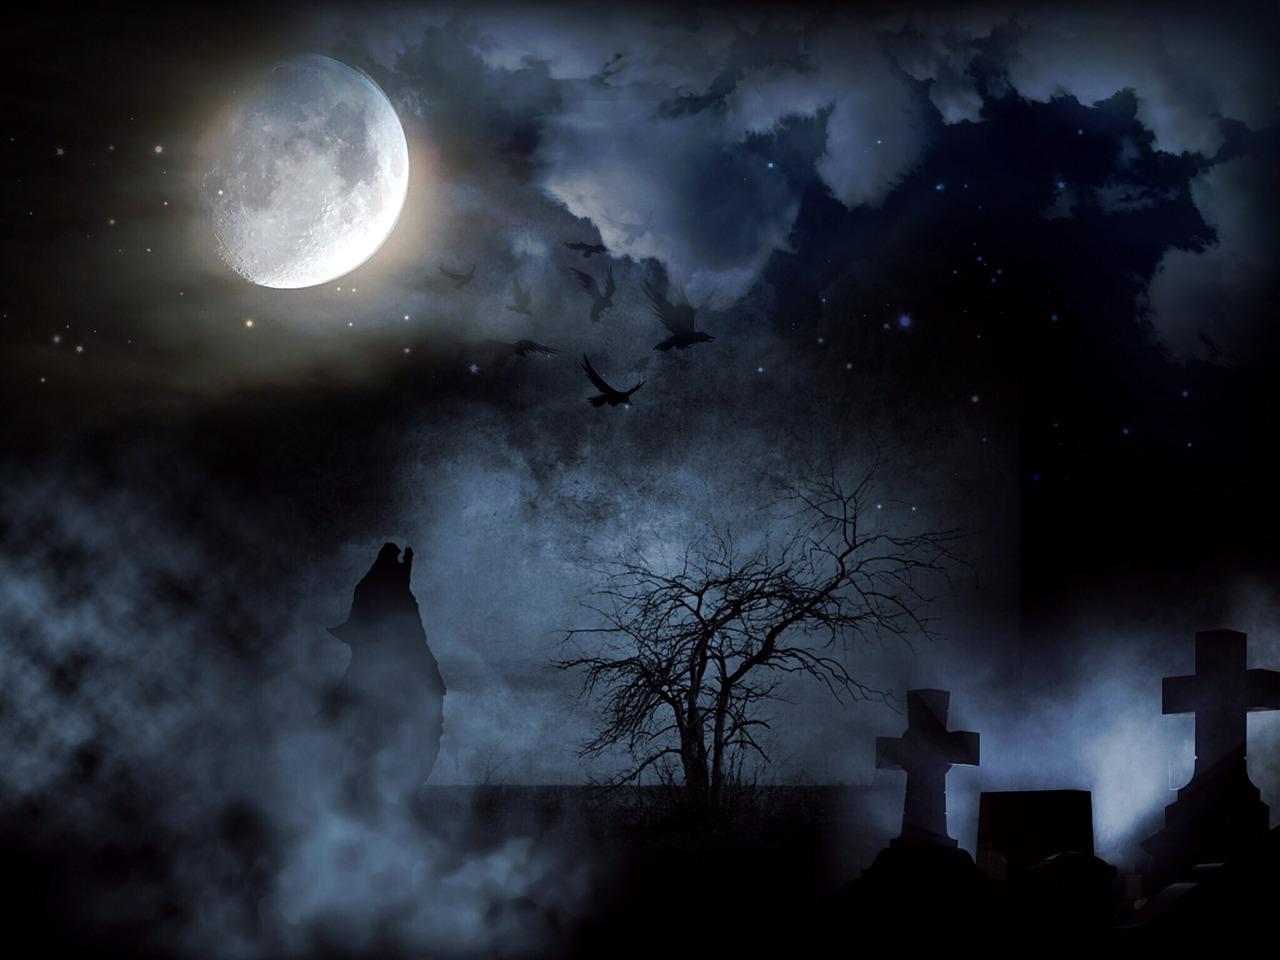 The Vampire's Rest